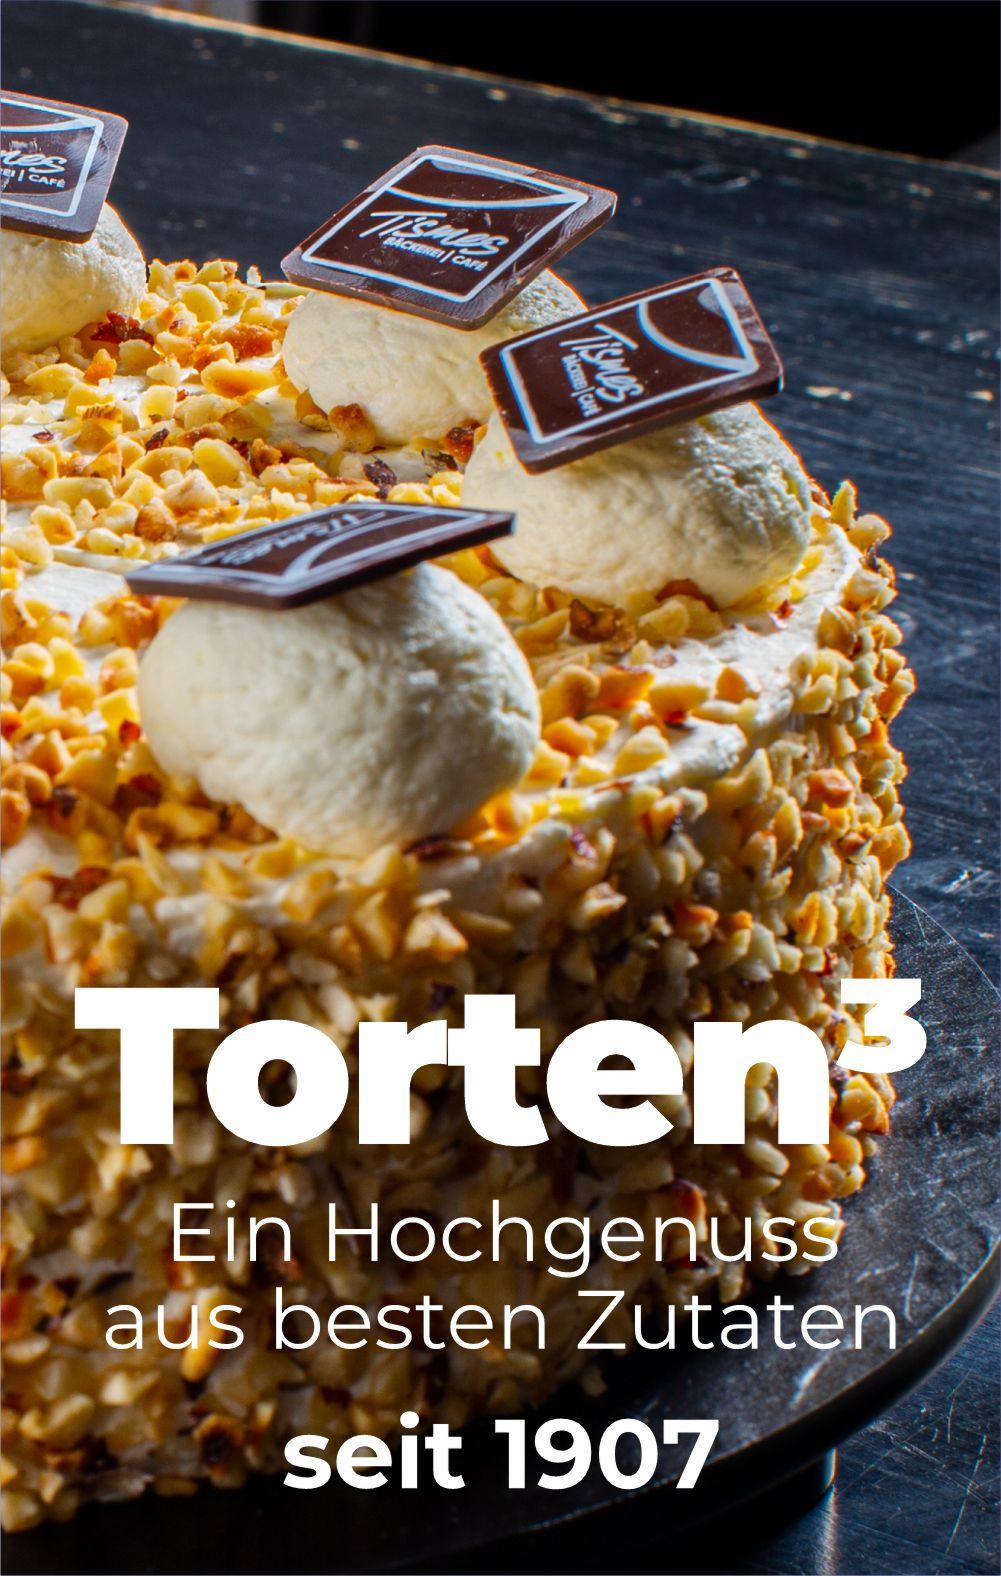 tismes_torten_005_xs